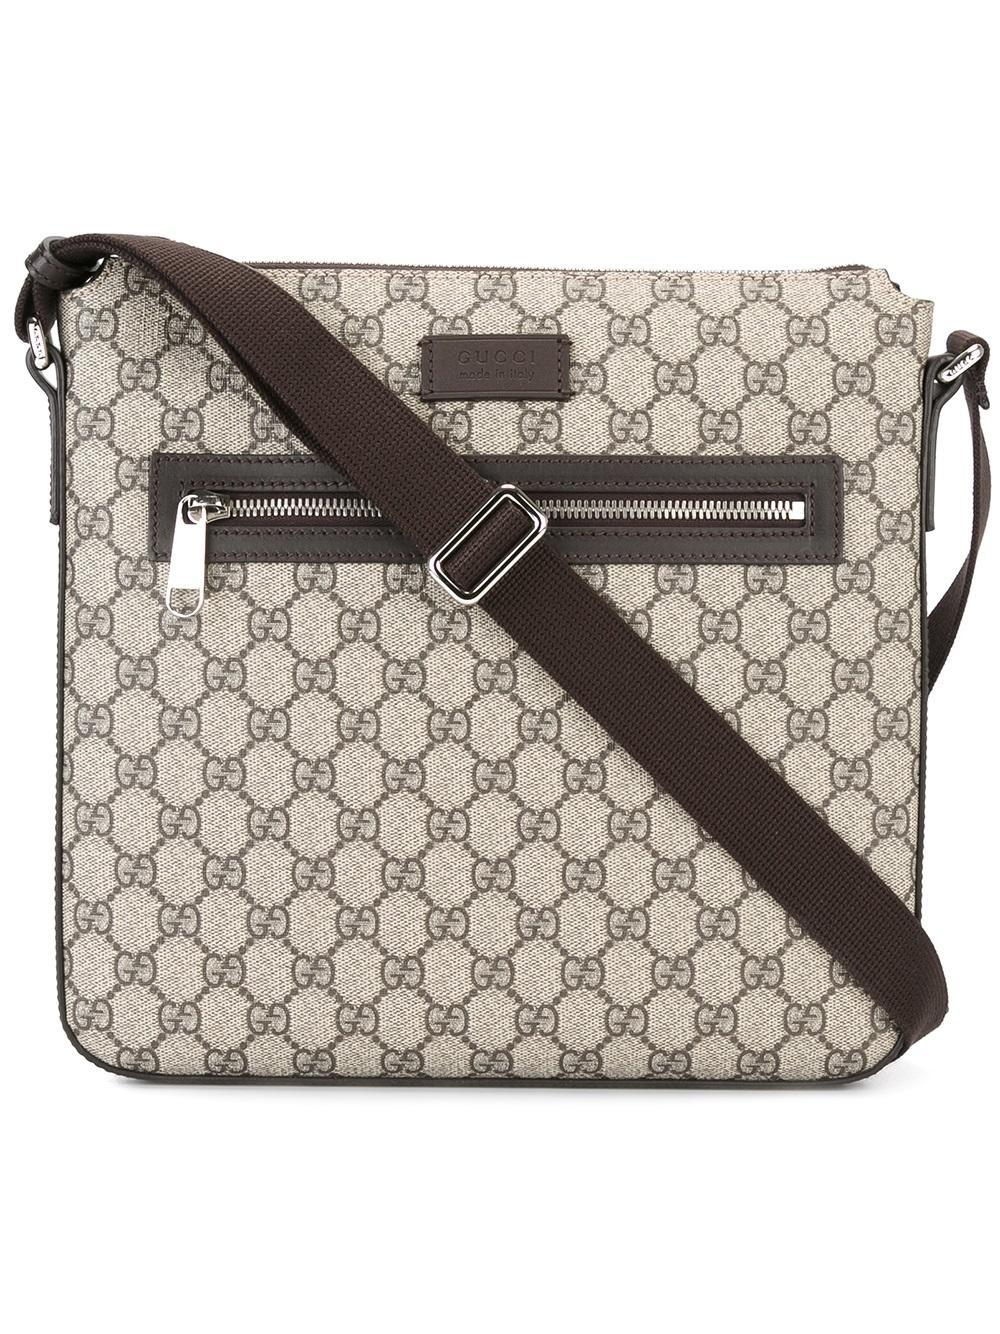 ff9b95a4c0c658 Gucci Gg Supreme Messenger Bag for Men - Lyst